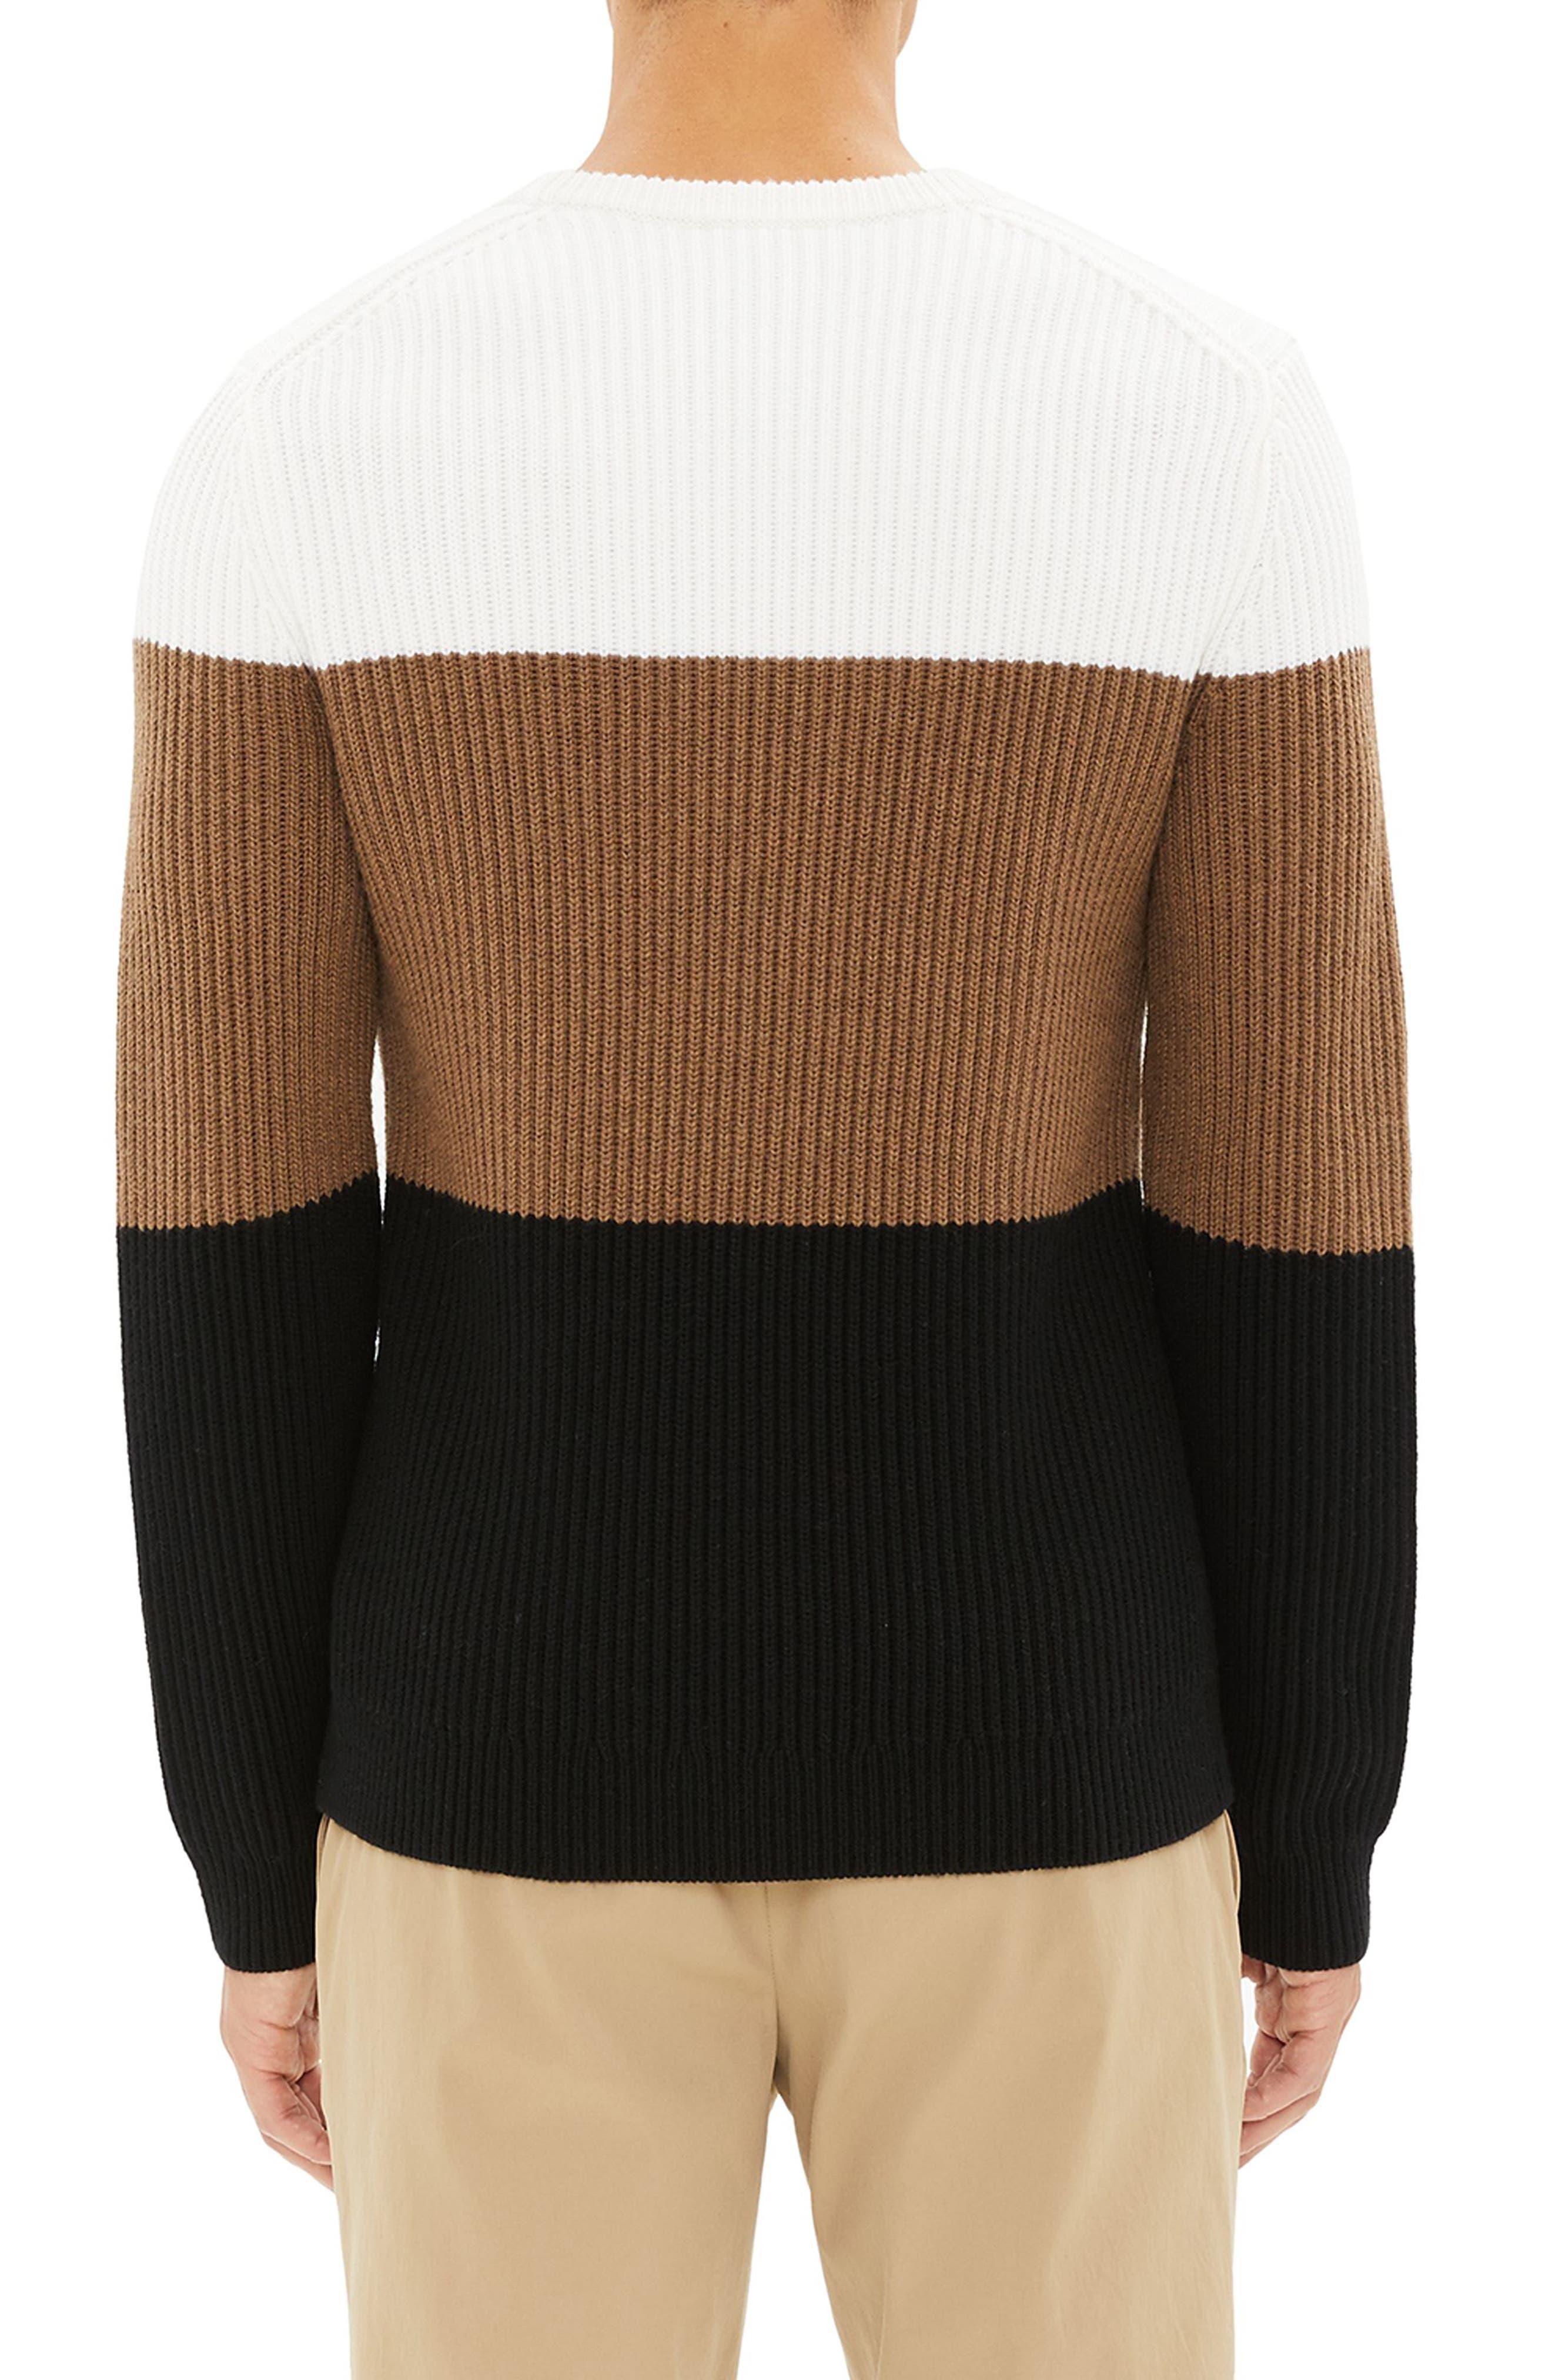 Romman Colorblock Merino Wool Sweater,                             Alternate thumbnail 2, color,                             110